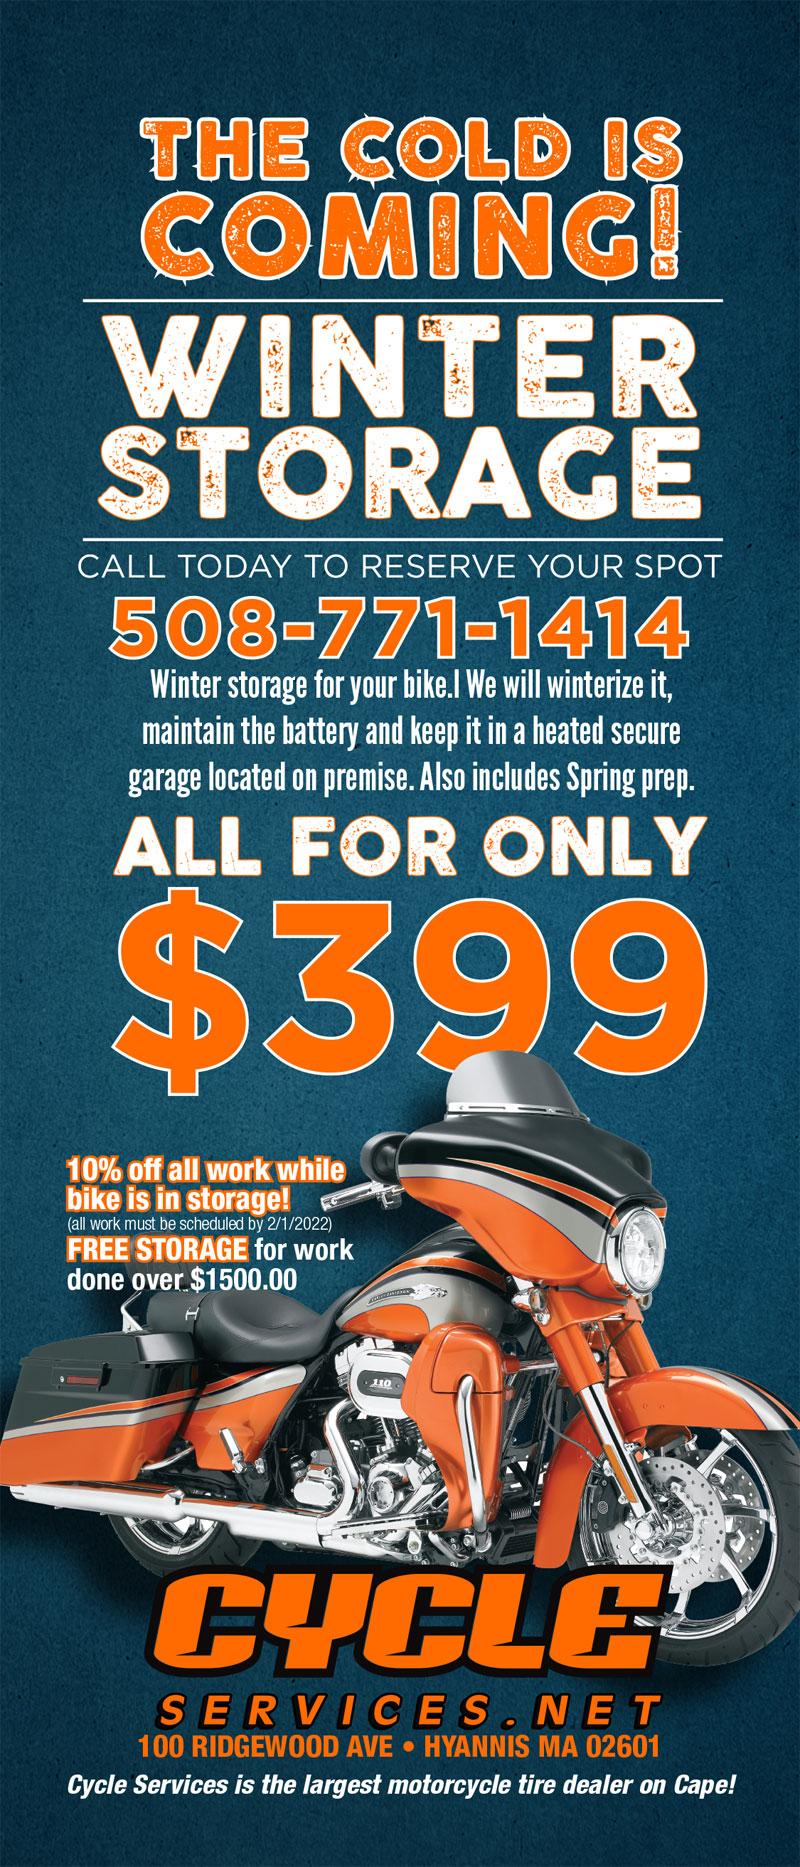 Winter Storage for $399